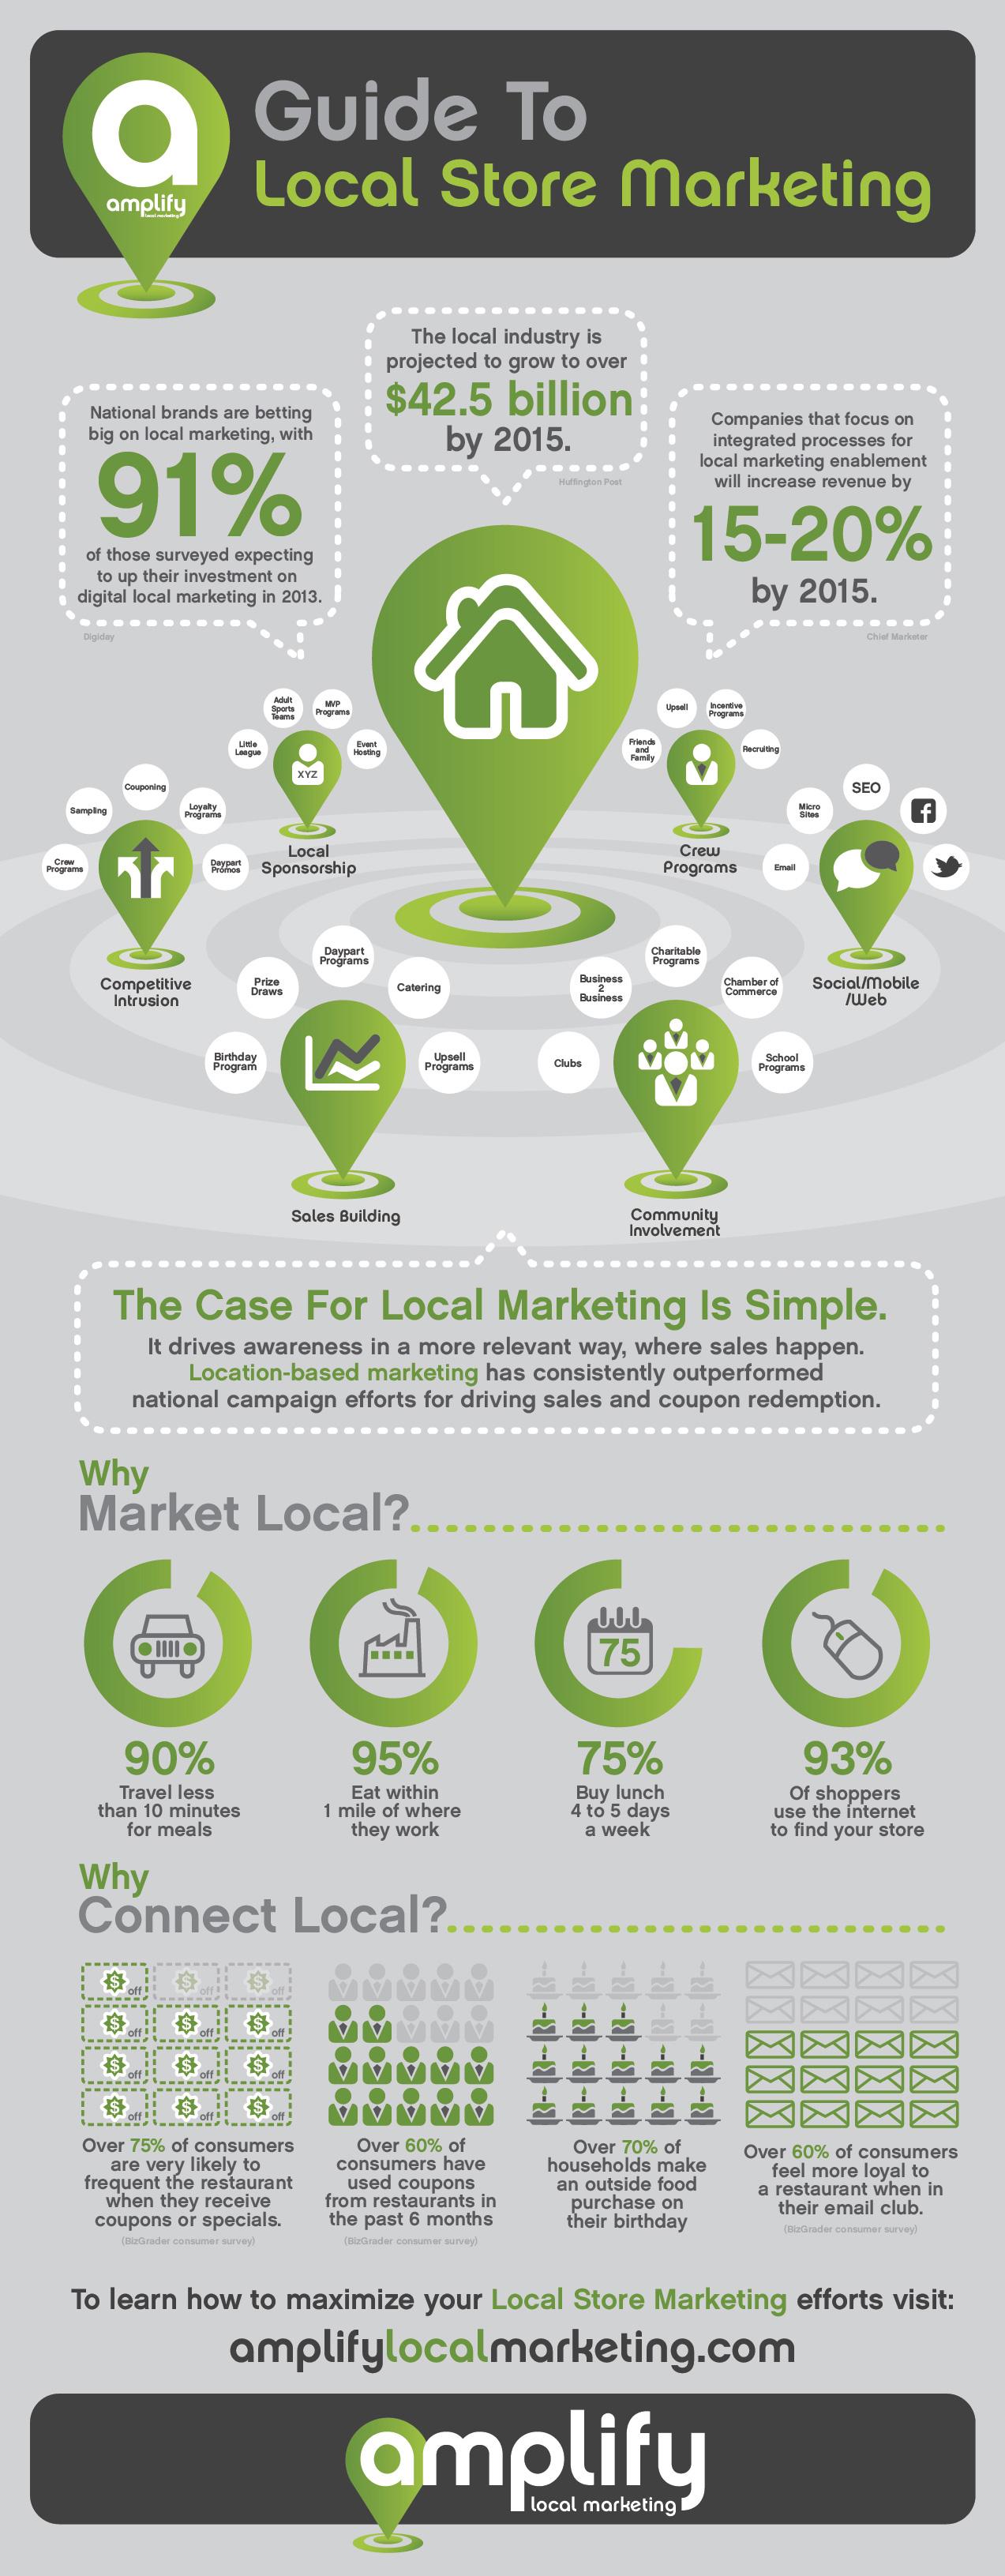 https://amplifylocalmarketing.com/wp-content/uploads/2013/02/Amplify-Infographics.jpg